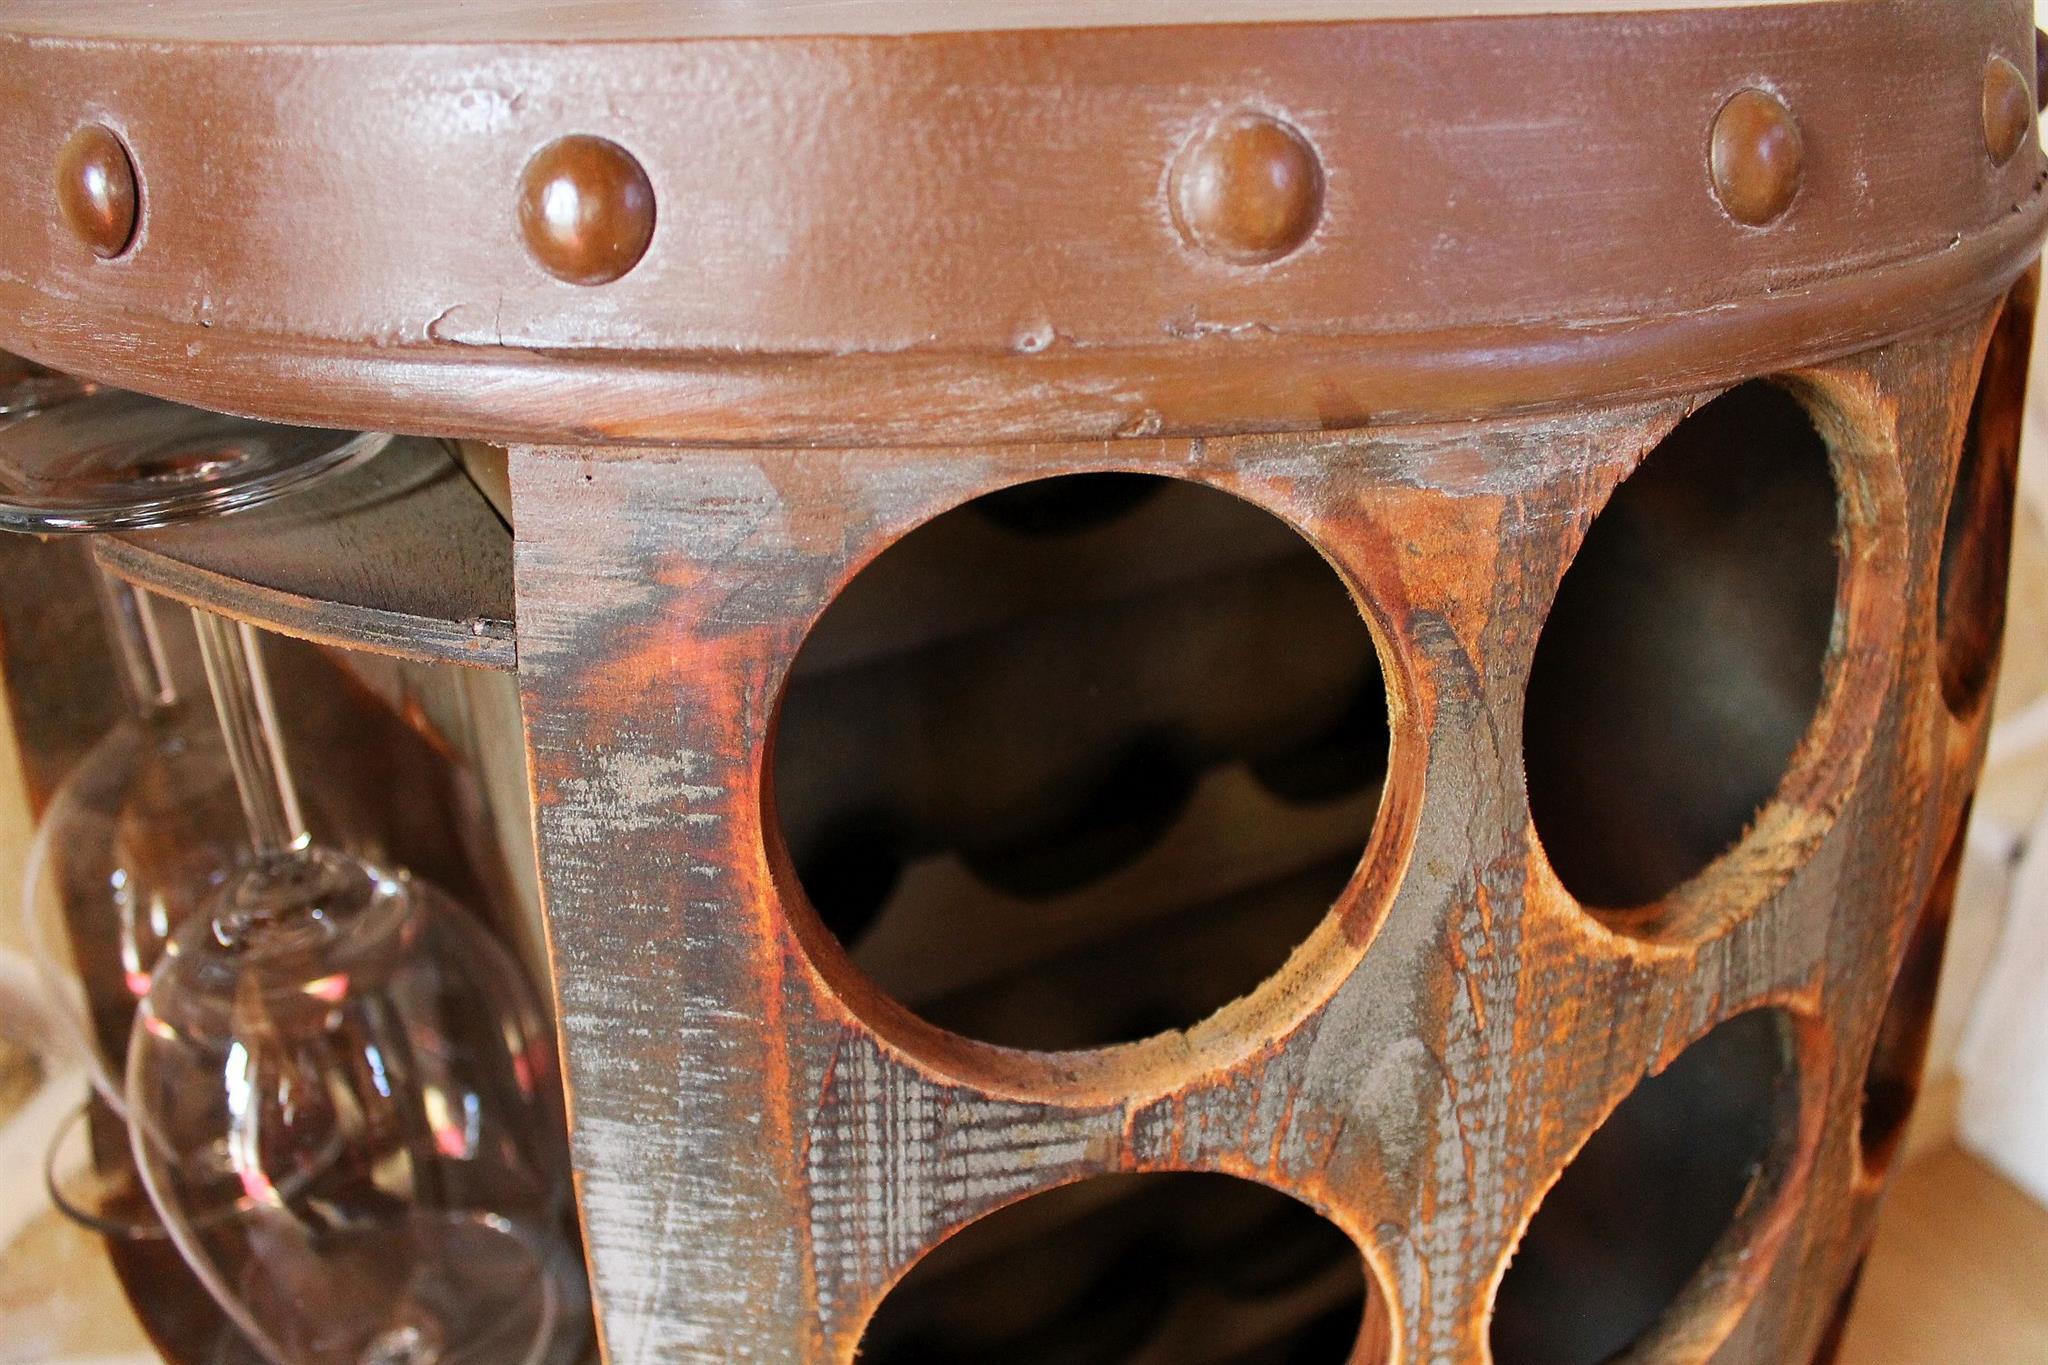 Weinregal Weinfass 1486 Beistelltisch Schrank Faß aus Holz 72cm ...